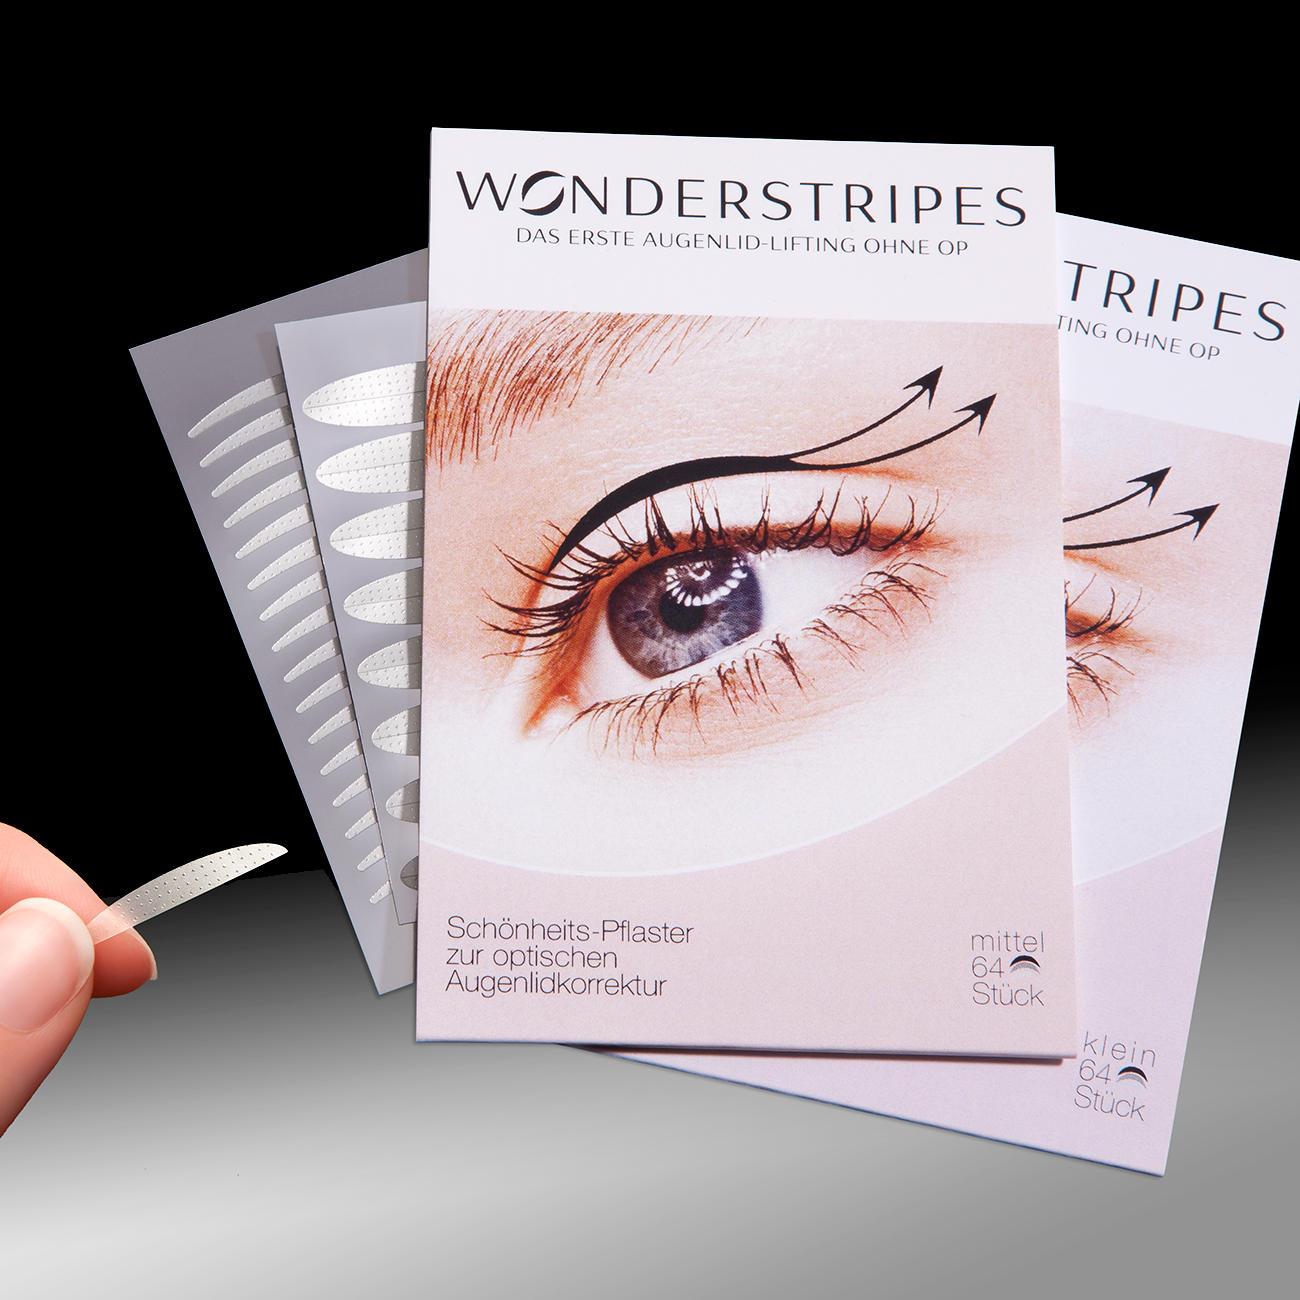 Wonderstripes-valentina-coco-chirurgia-plastica-beauty-fashion-blogger